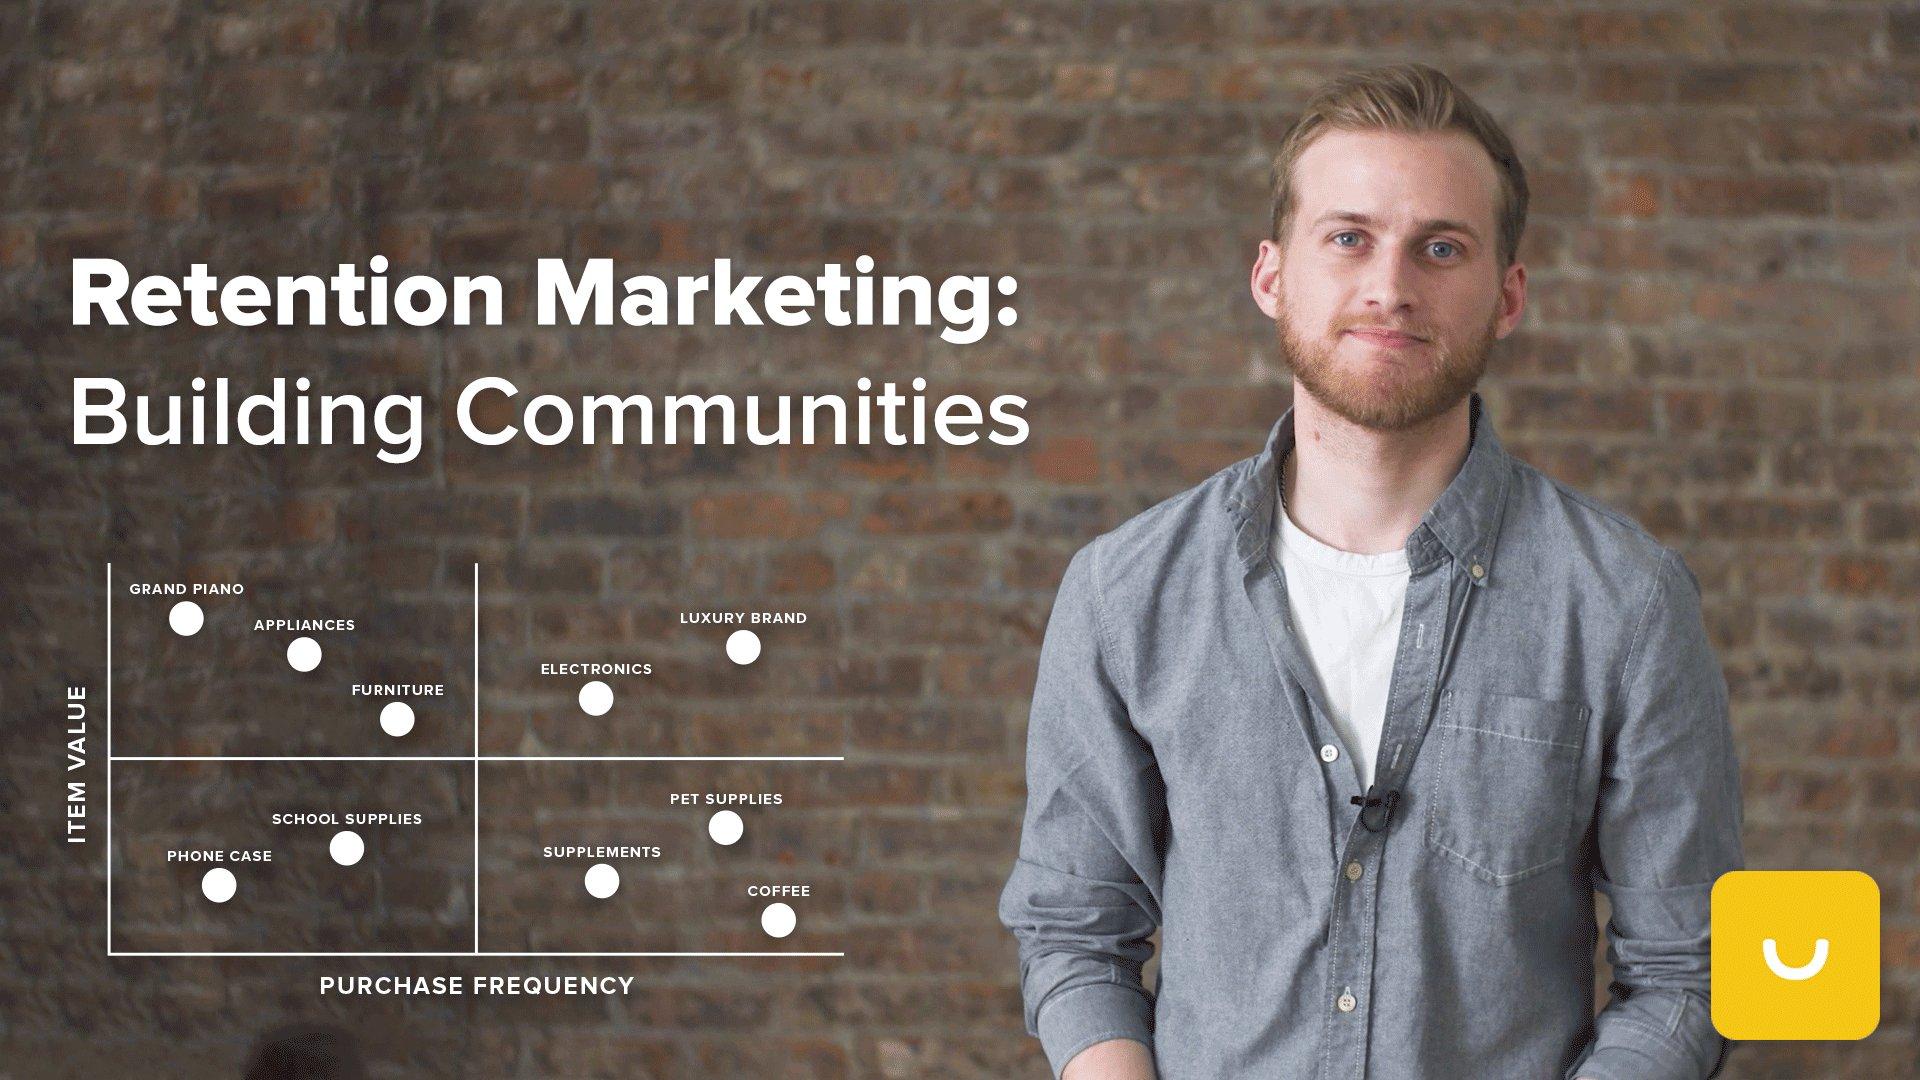 Marketing courses, skillshare courses, free marketing courses , free skillshare courses